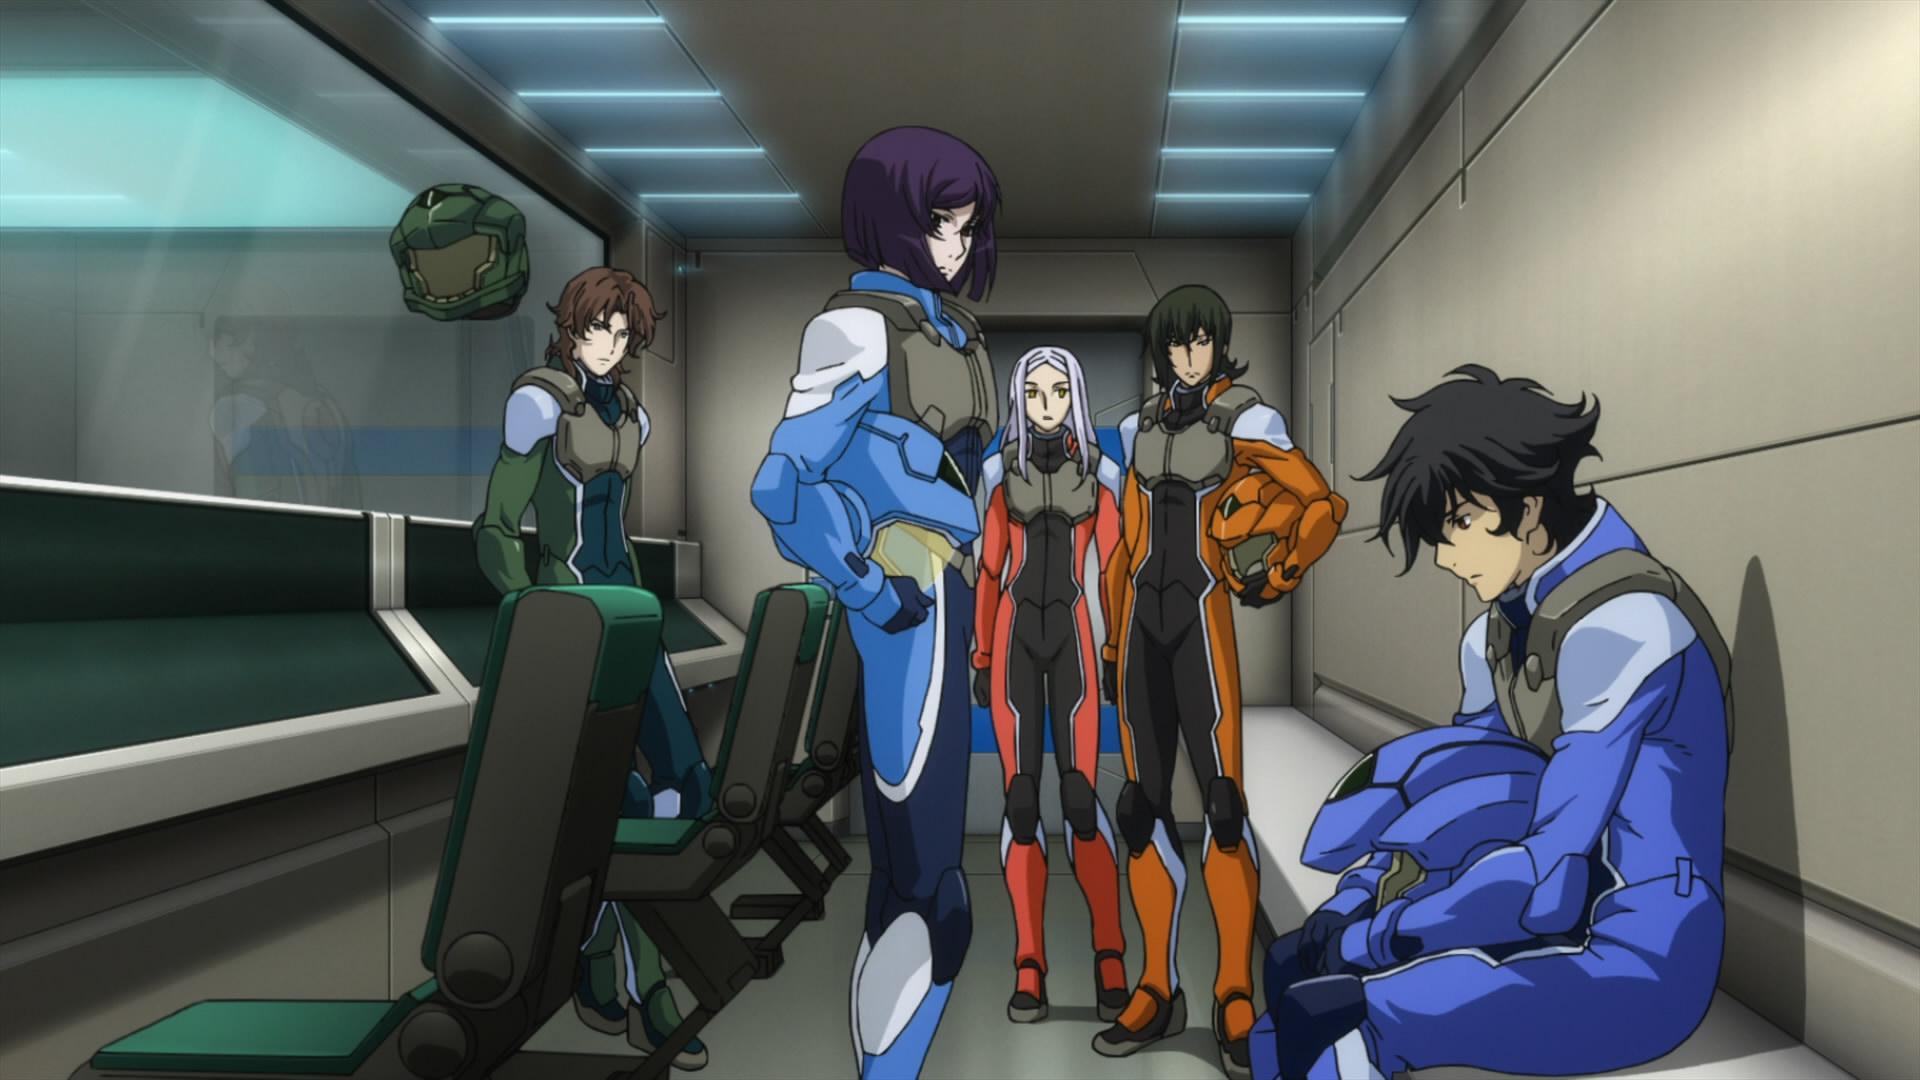 [gSS]_Mobile_Suit_Gundam_00_-_A_wakening_of_the_Trailblazer_(1080p)_[2B252856].mkv_snapshot_00.51.39_[2011.01.07_04.29.53]